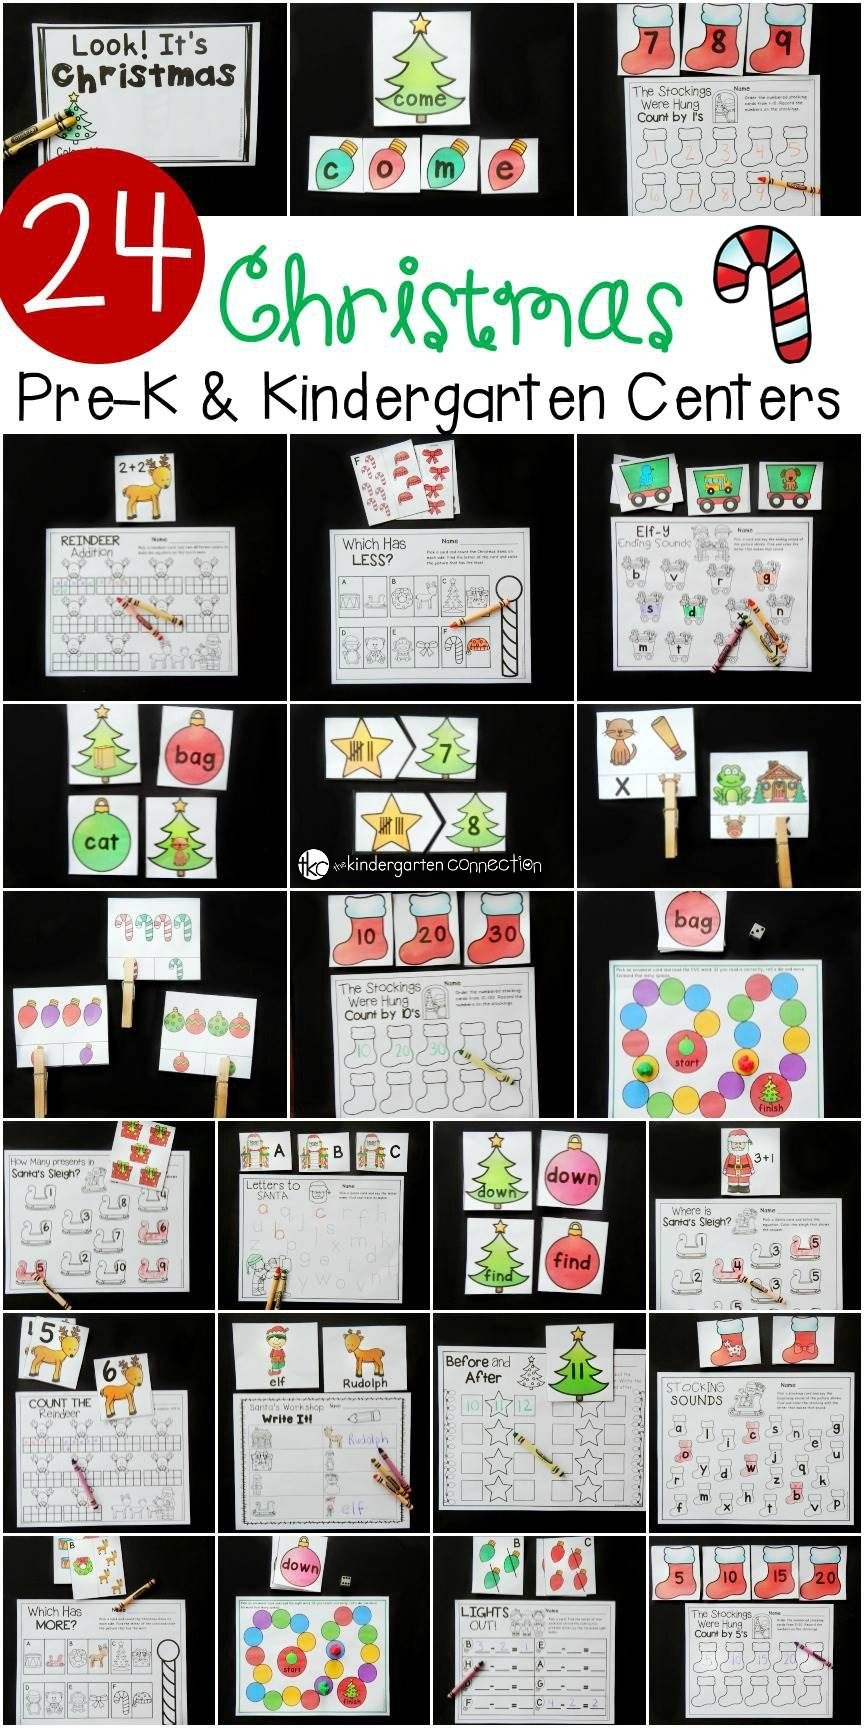 Christmas Centers And Activities For Pre K Kindergarten The Kindergarten Connection Teaching Resources Christmas Math Preschool Christmas Kindergarten Ce [ 1728 x 864 Pixel ]